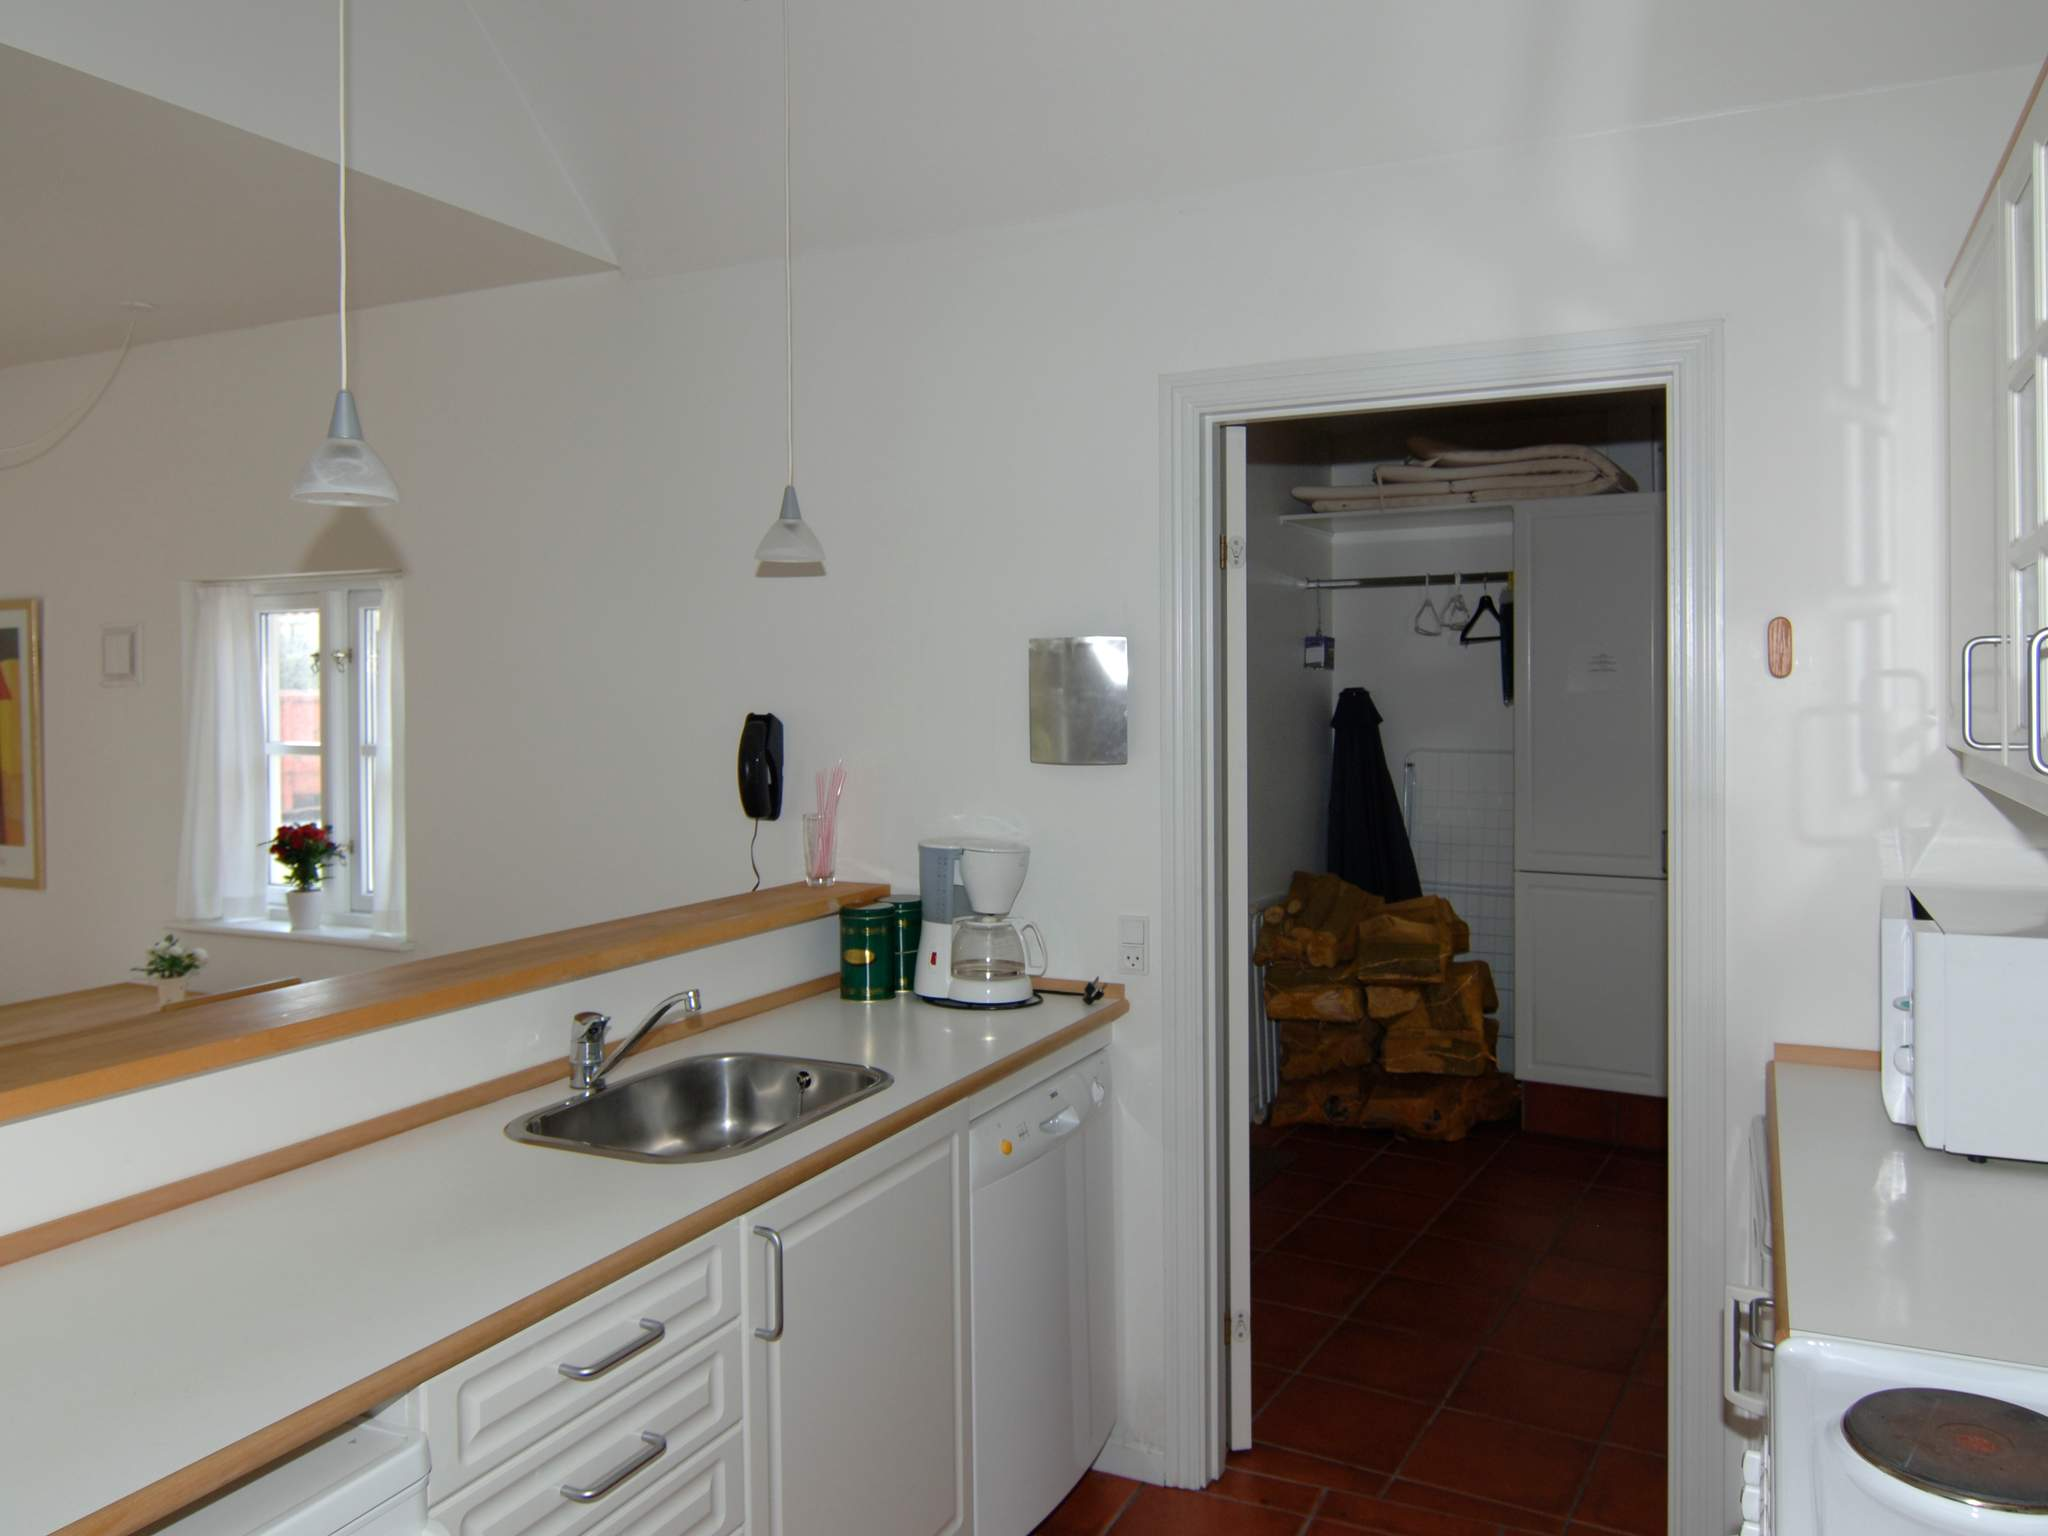 Ferienhaus Blåvand (241666), Blåvand, , Westjütland, Dänemark, Bild 6